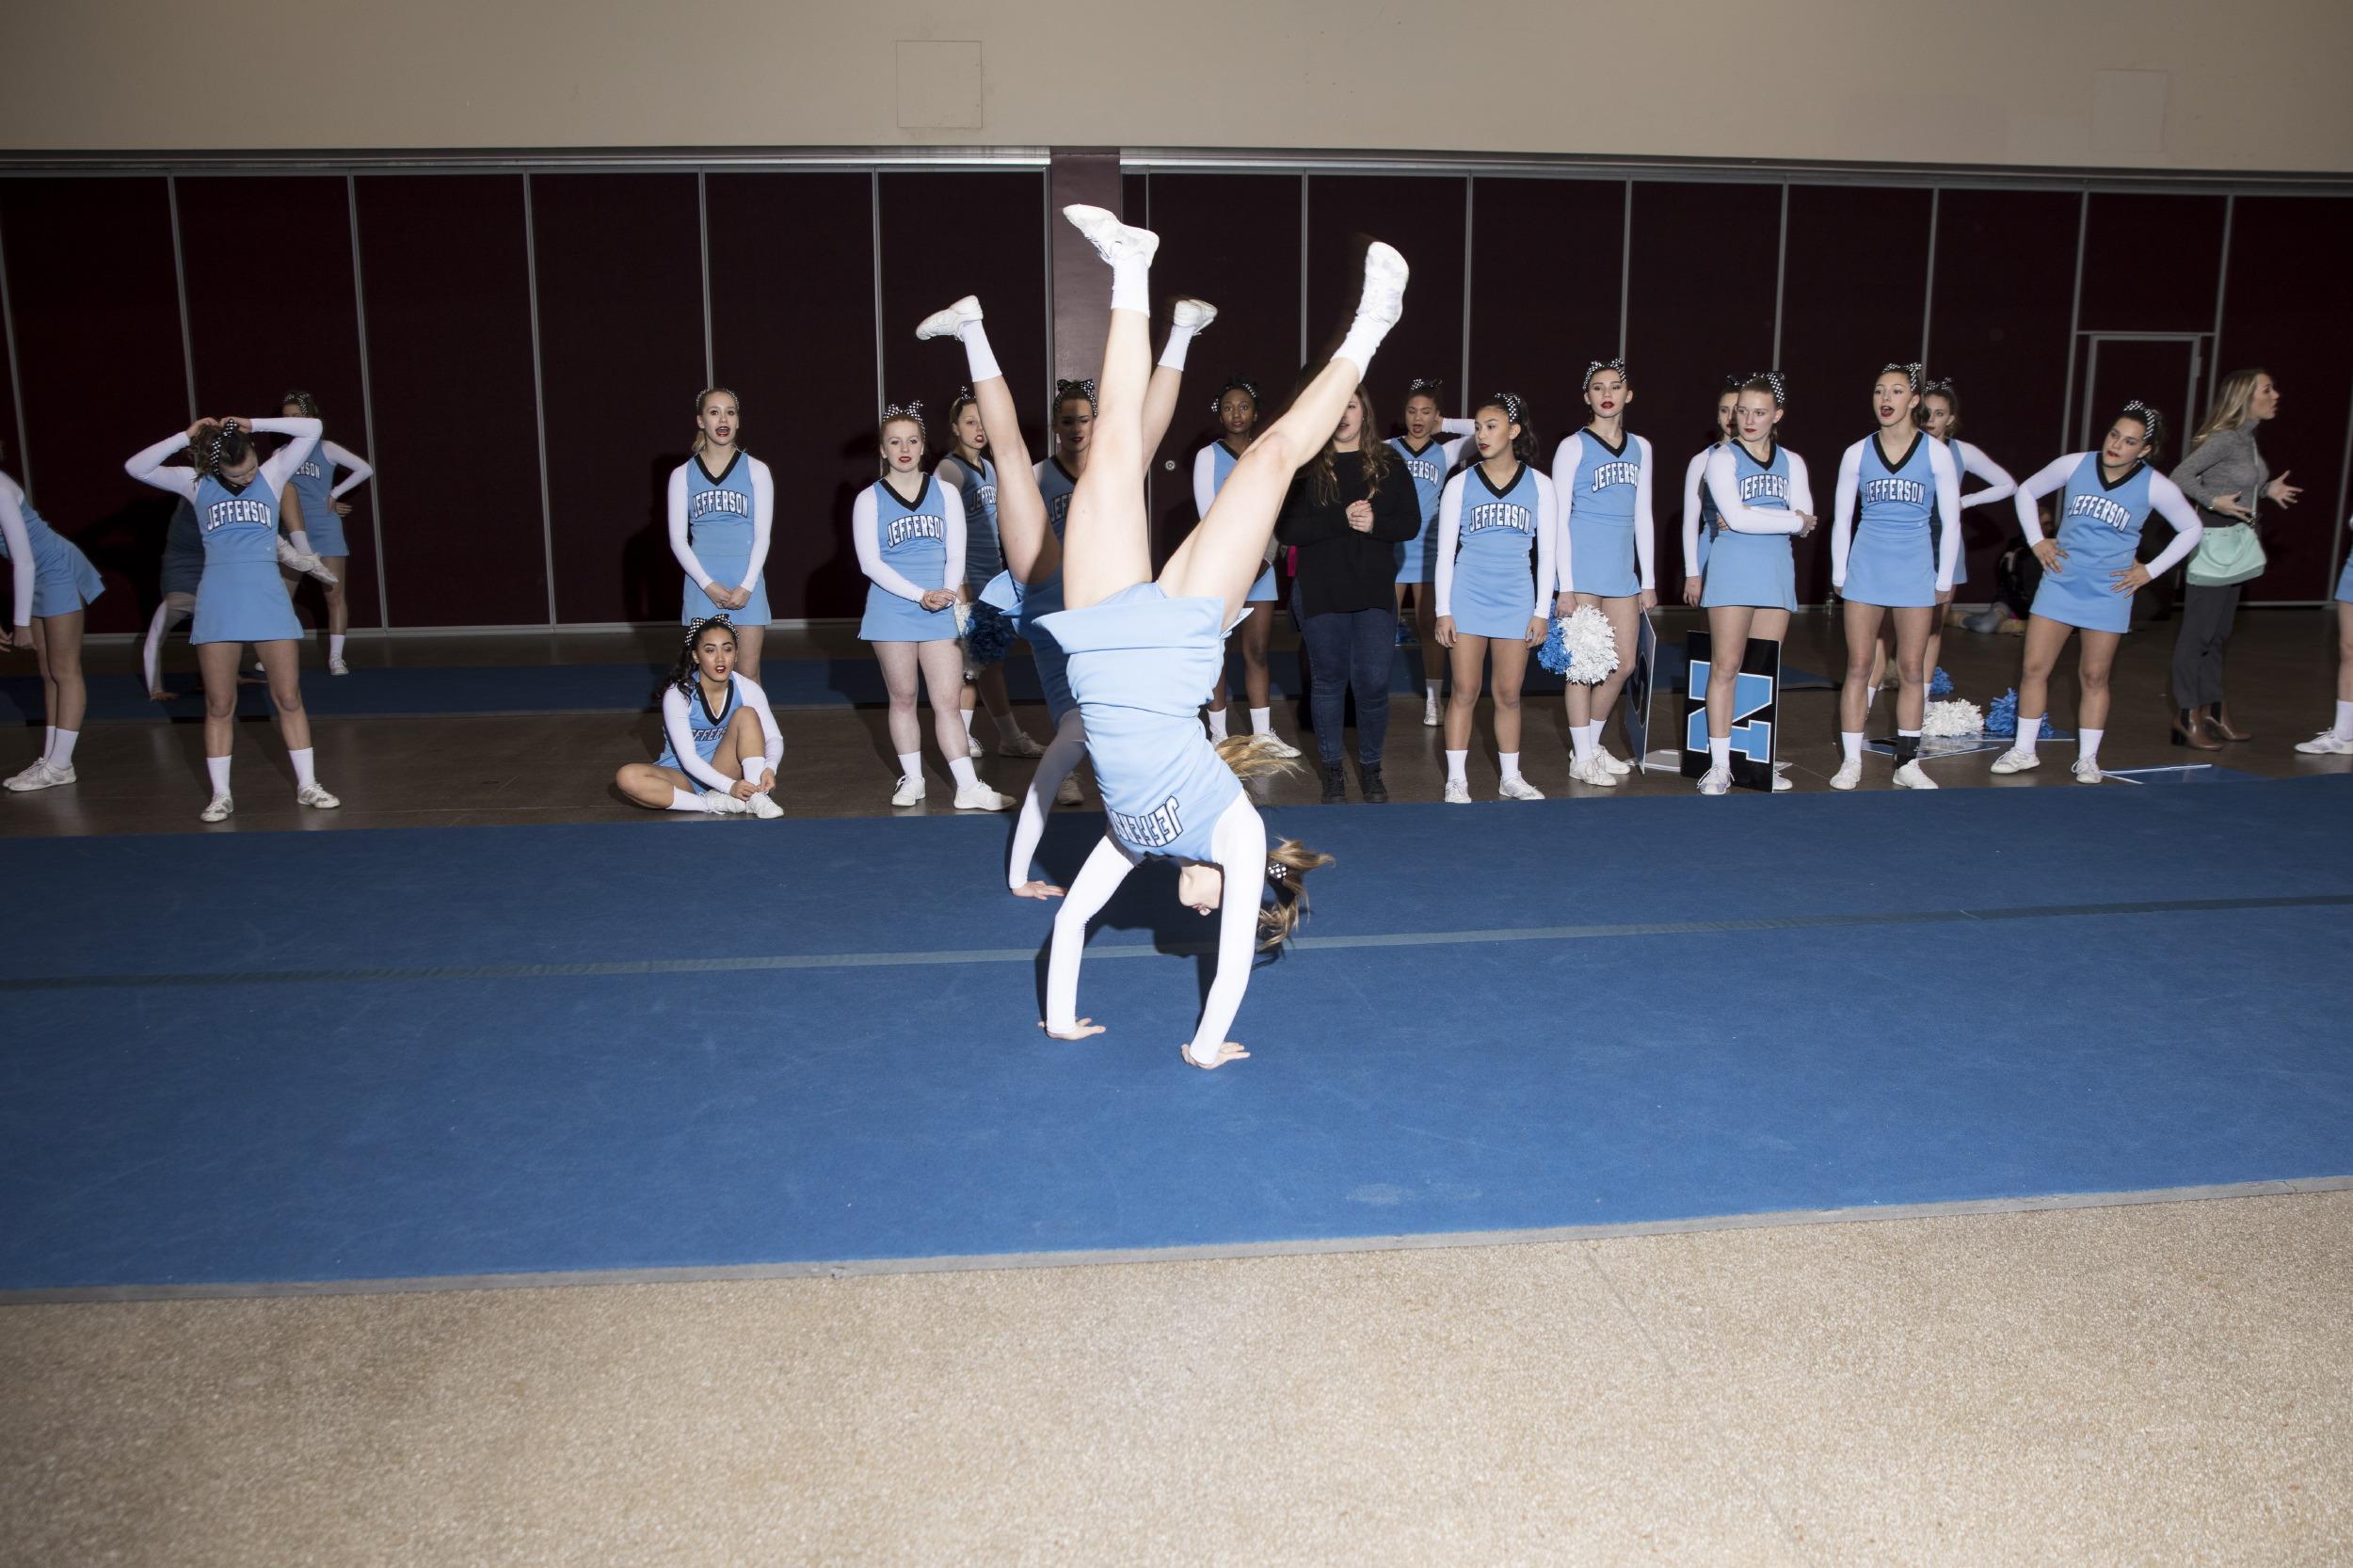 170128_Cheerleading_000528T.JPG